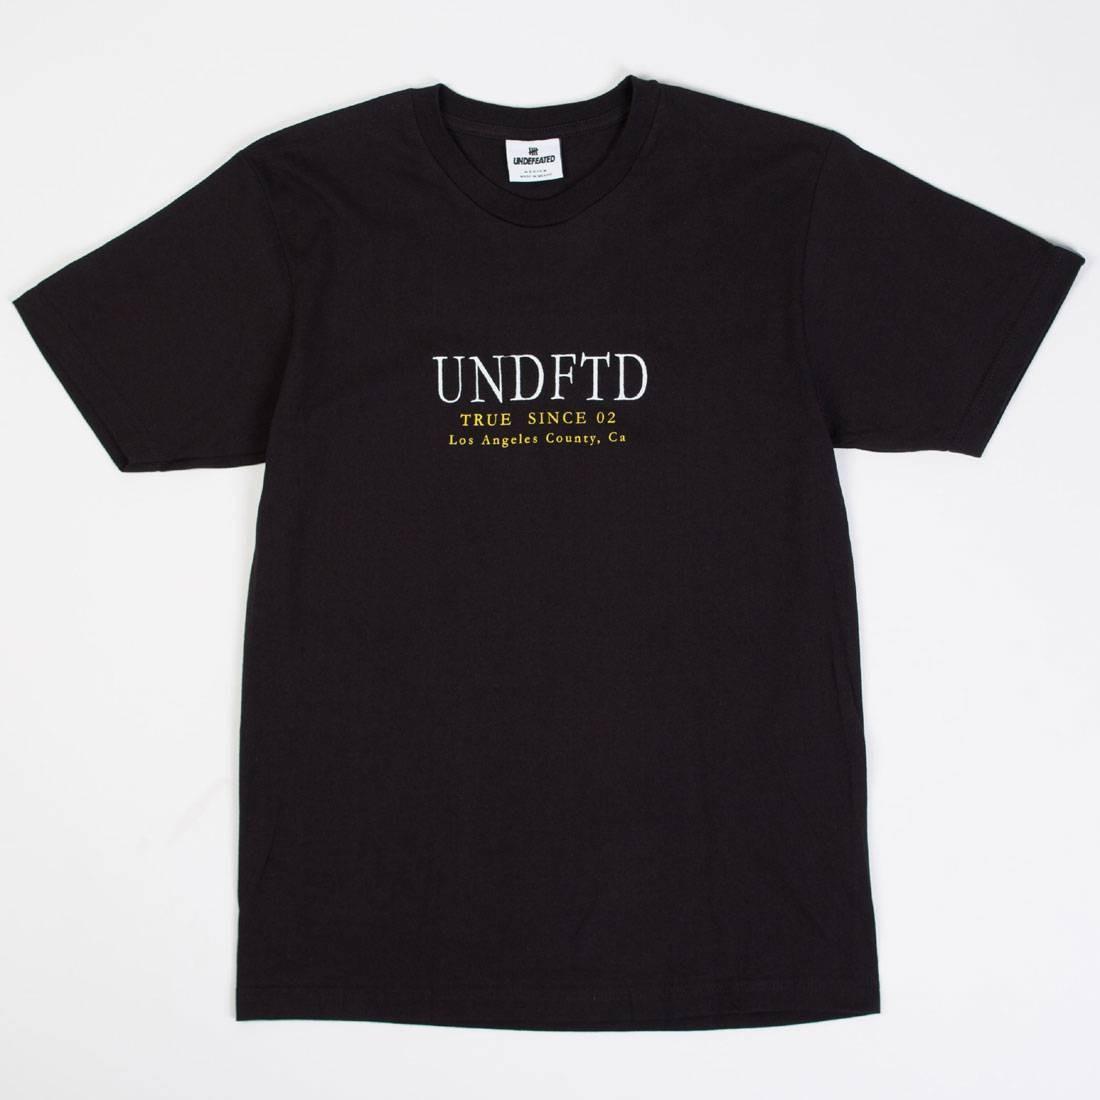 Undefeated Men True Since 02 Tee (black)